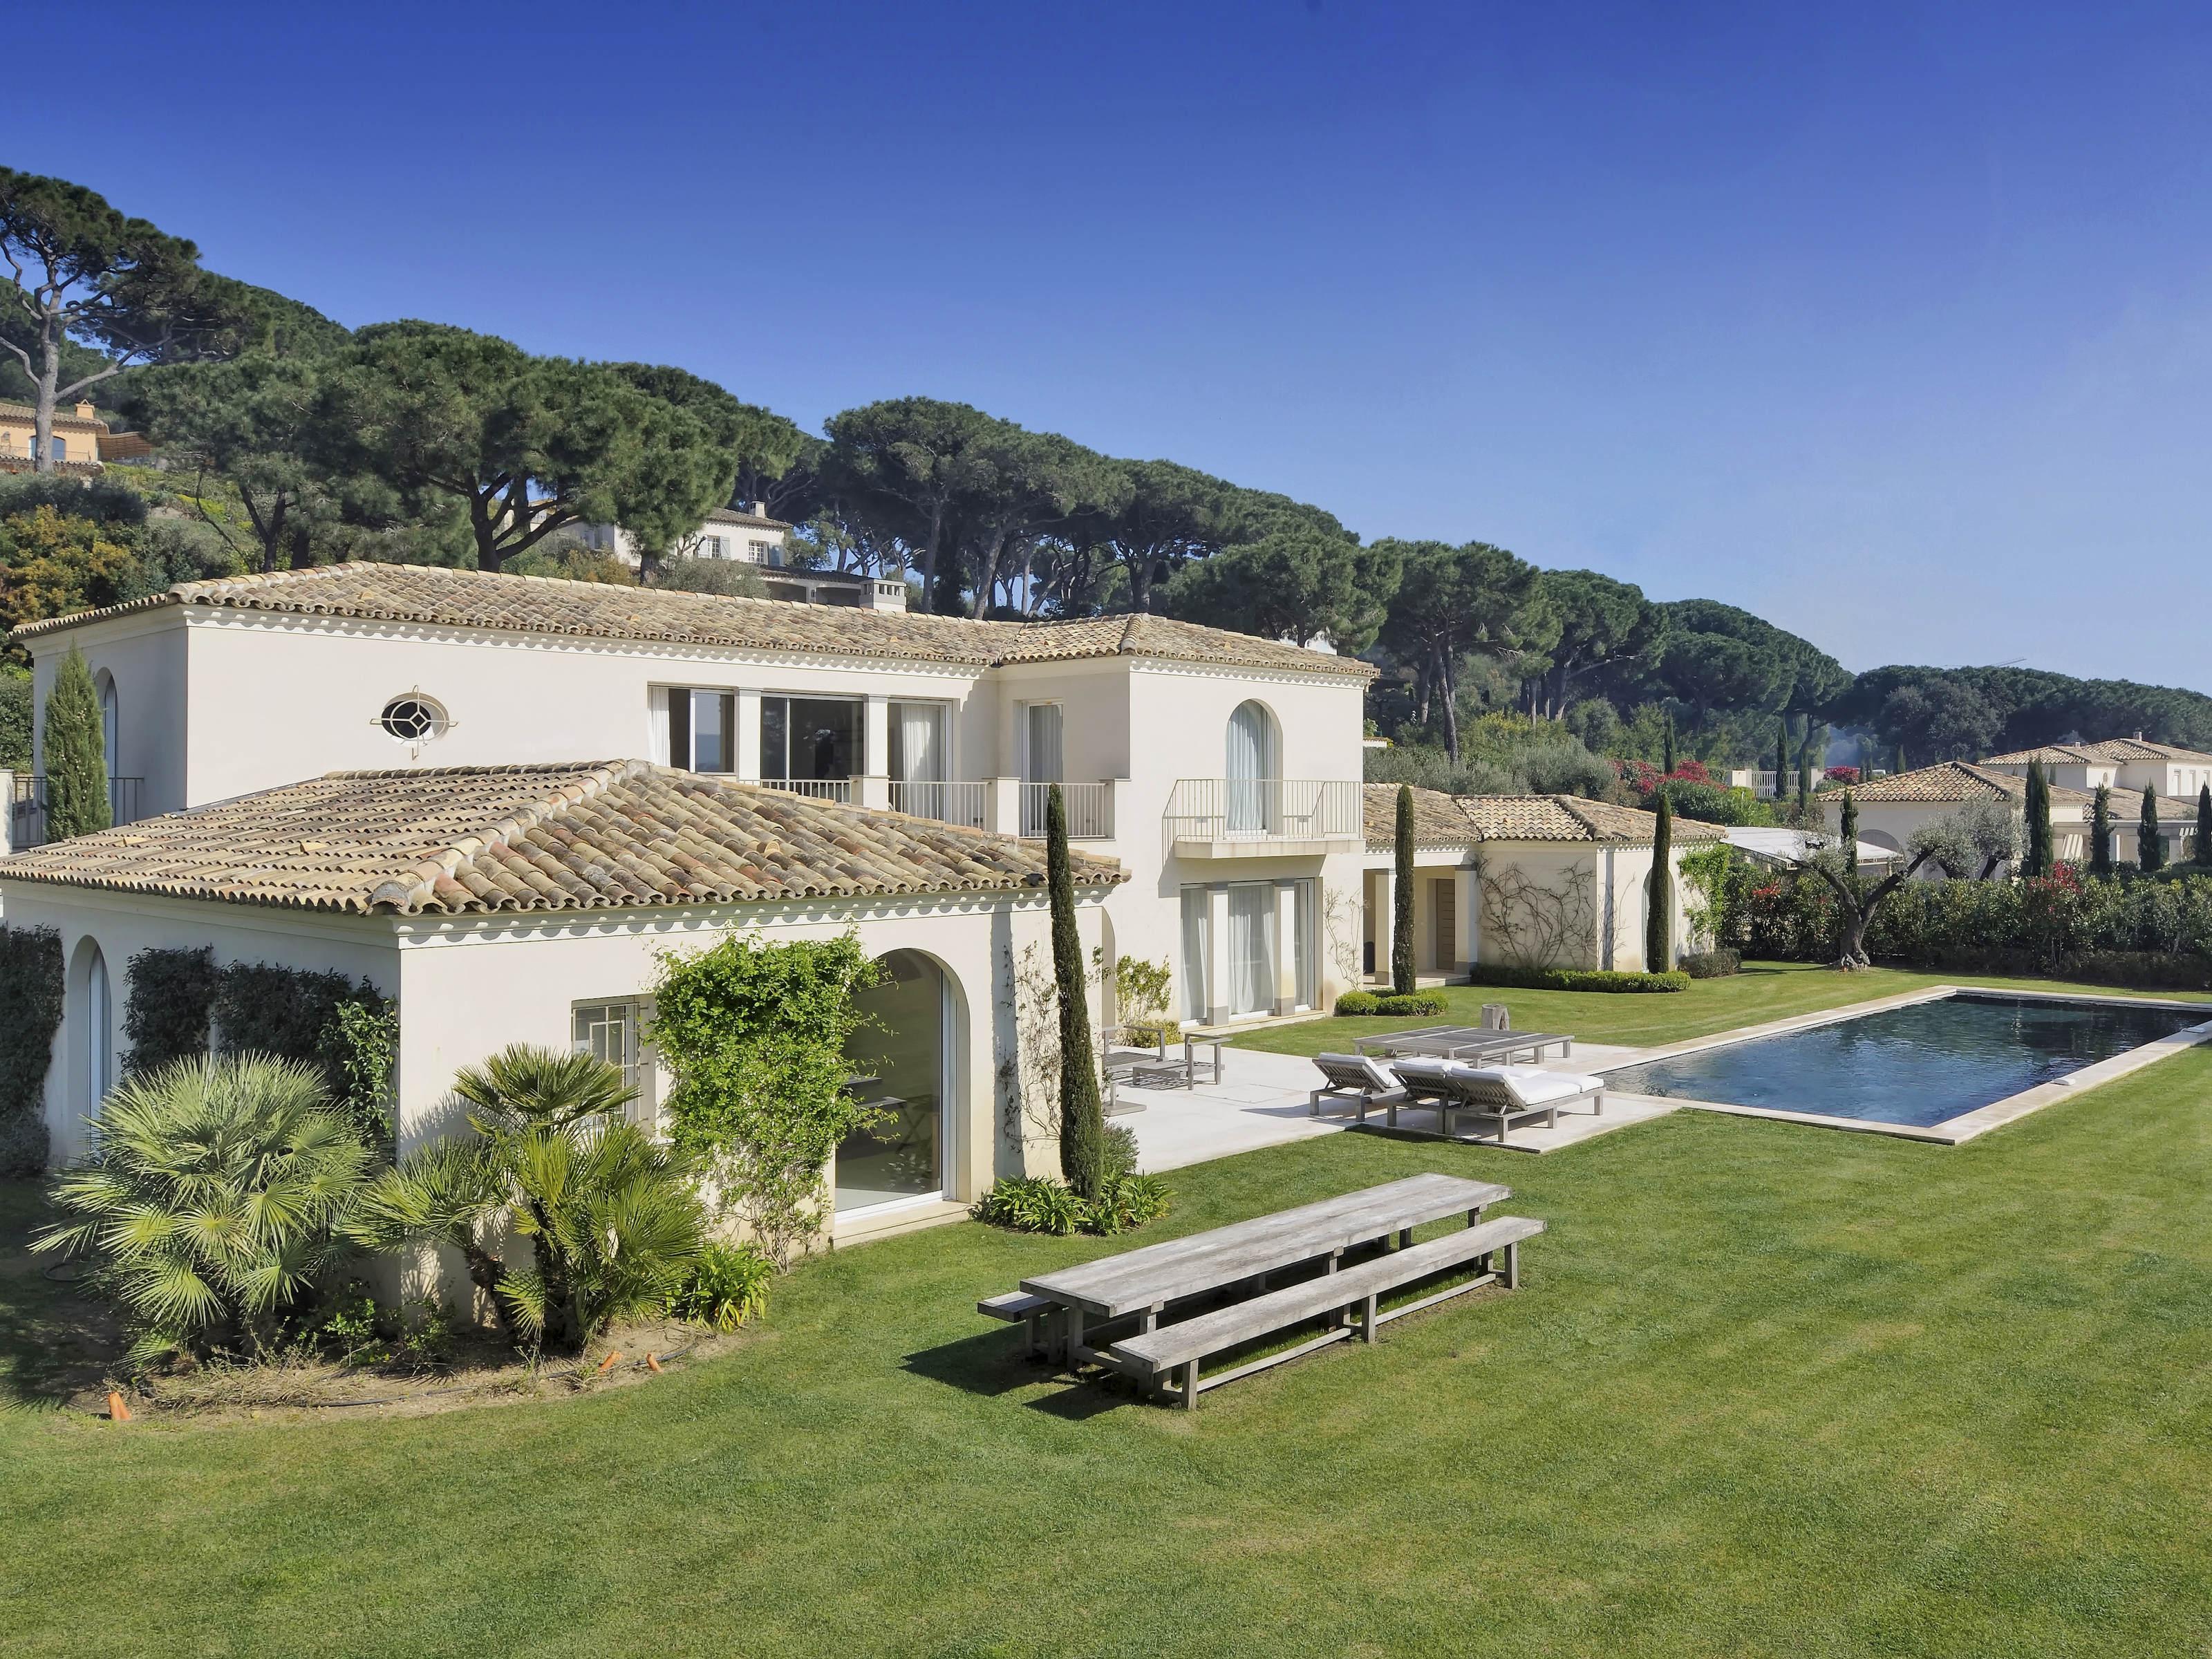 Single Family Home for Sale at Charming modern villa in Saint-Tropez Saint Tropez, Provence-Alpes-Cote D'Azur 83990 France